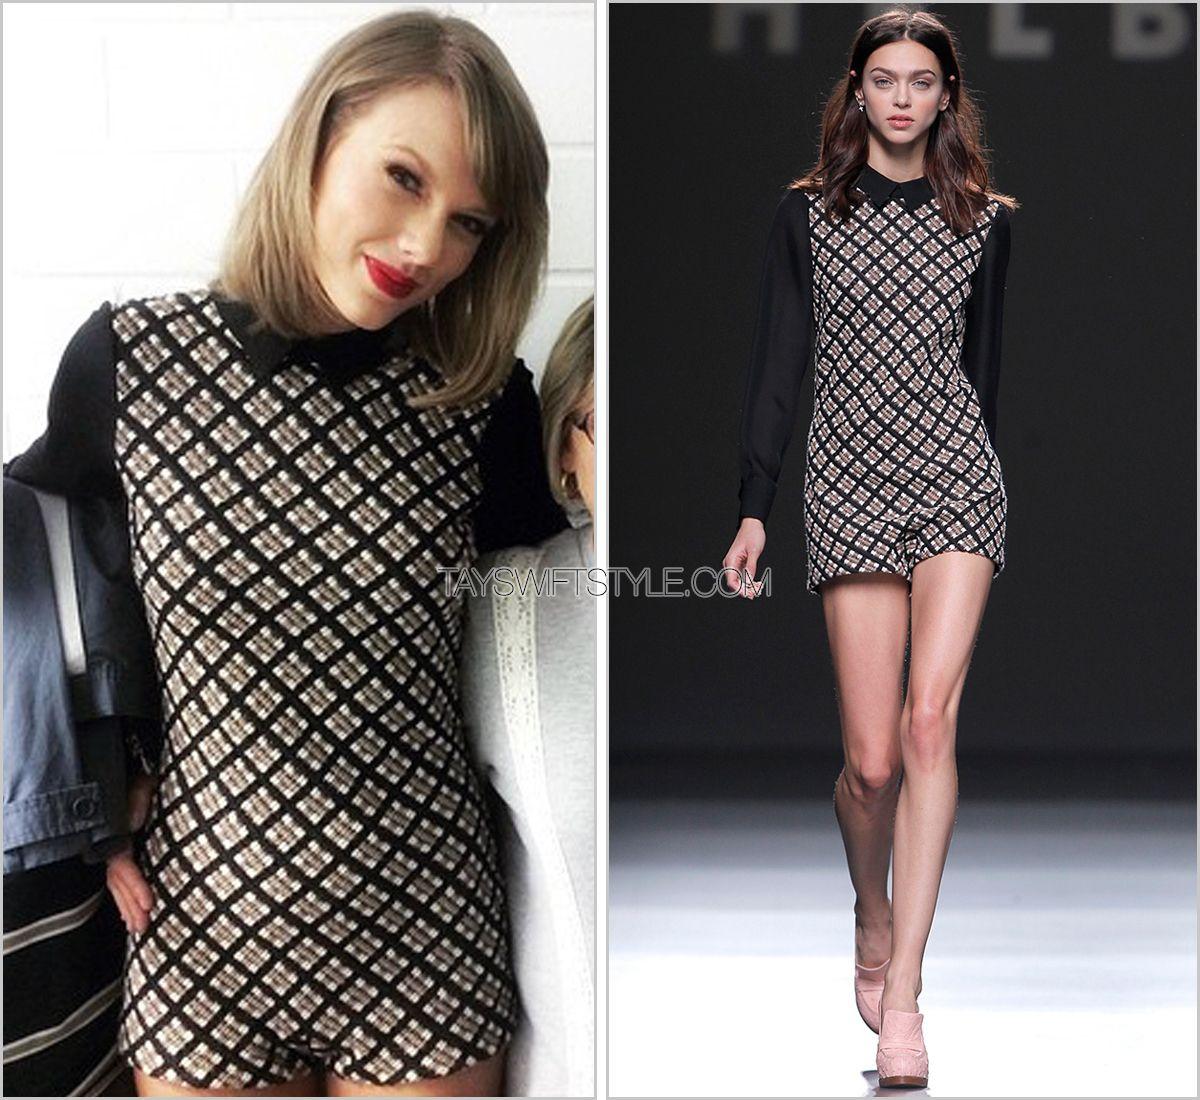 Taylor swift style fashion pinterest taylor swift style taylor swift style kristyandbryce Gallery